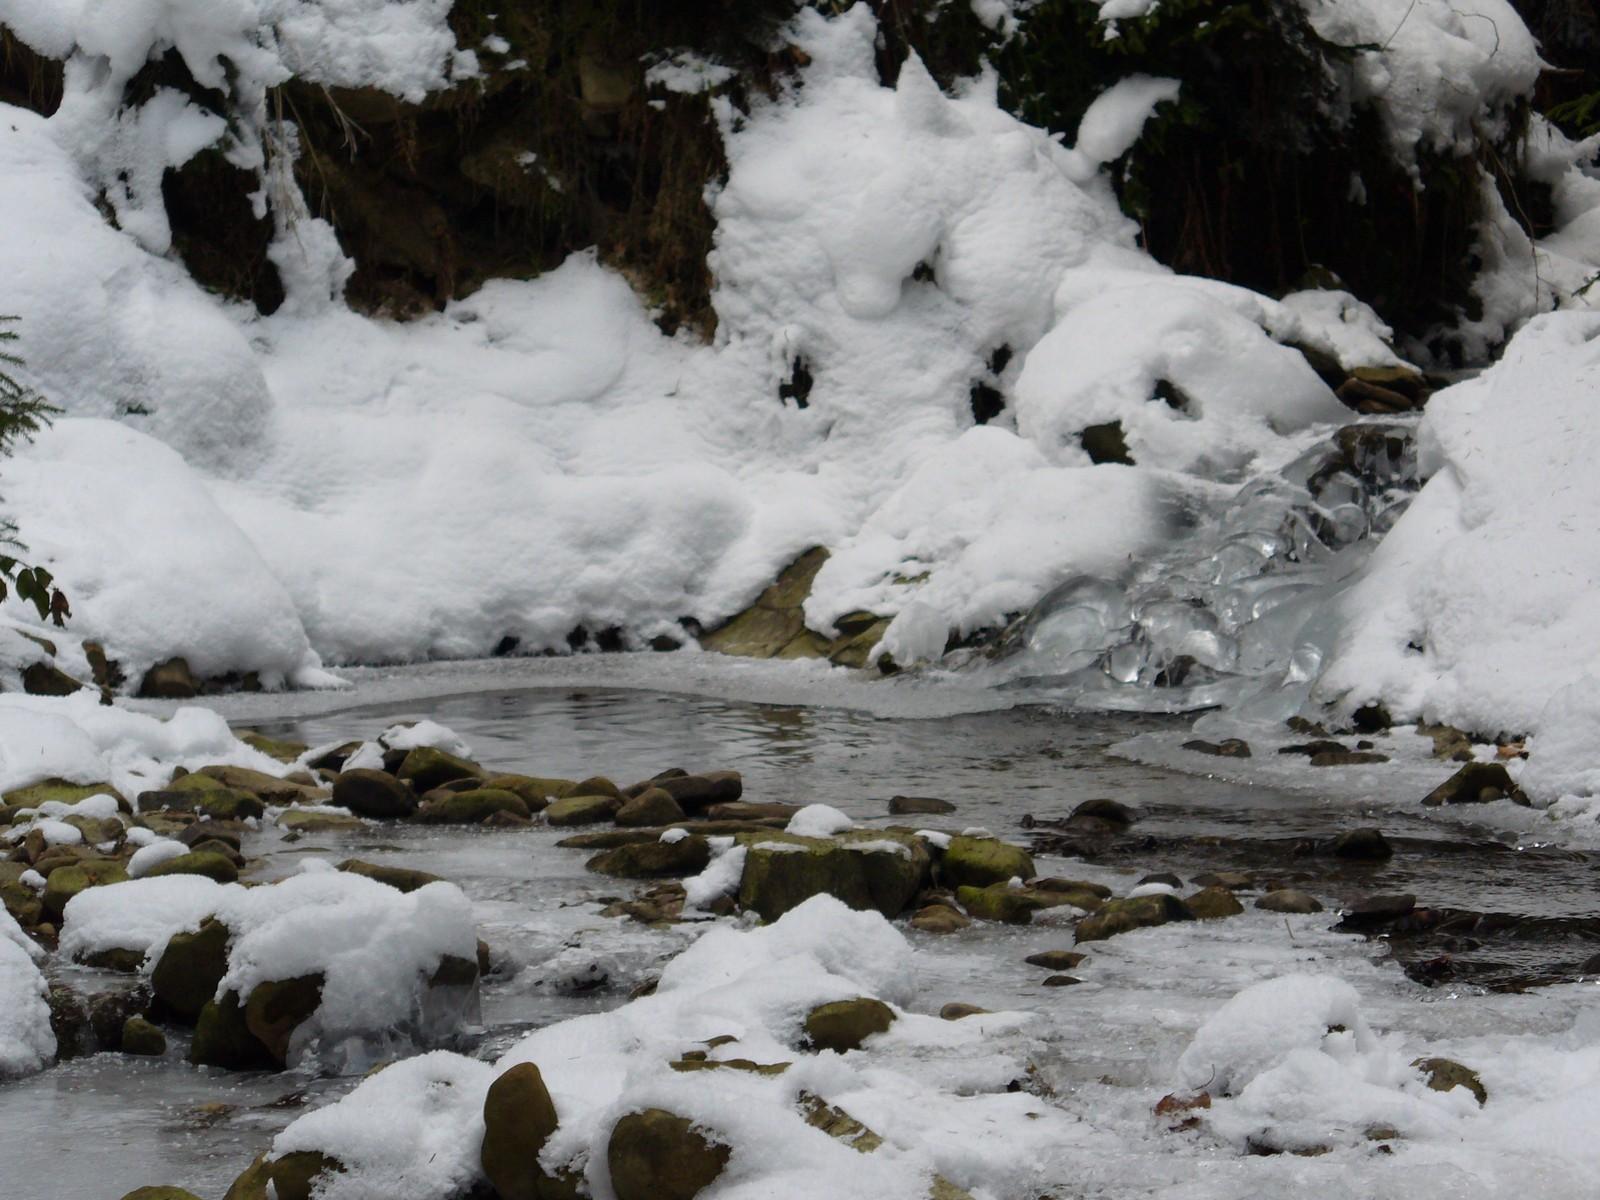 Leśny strumyk zimą